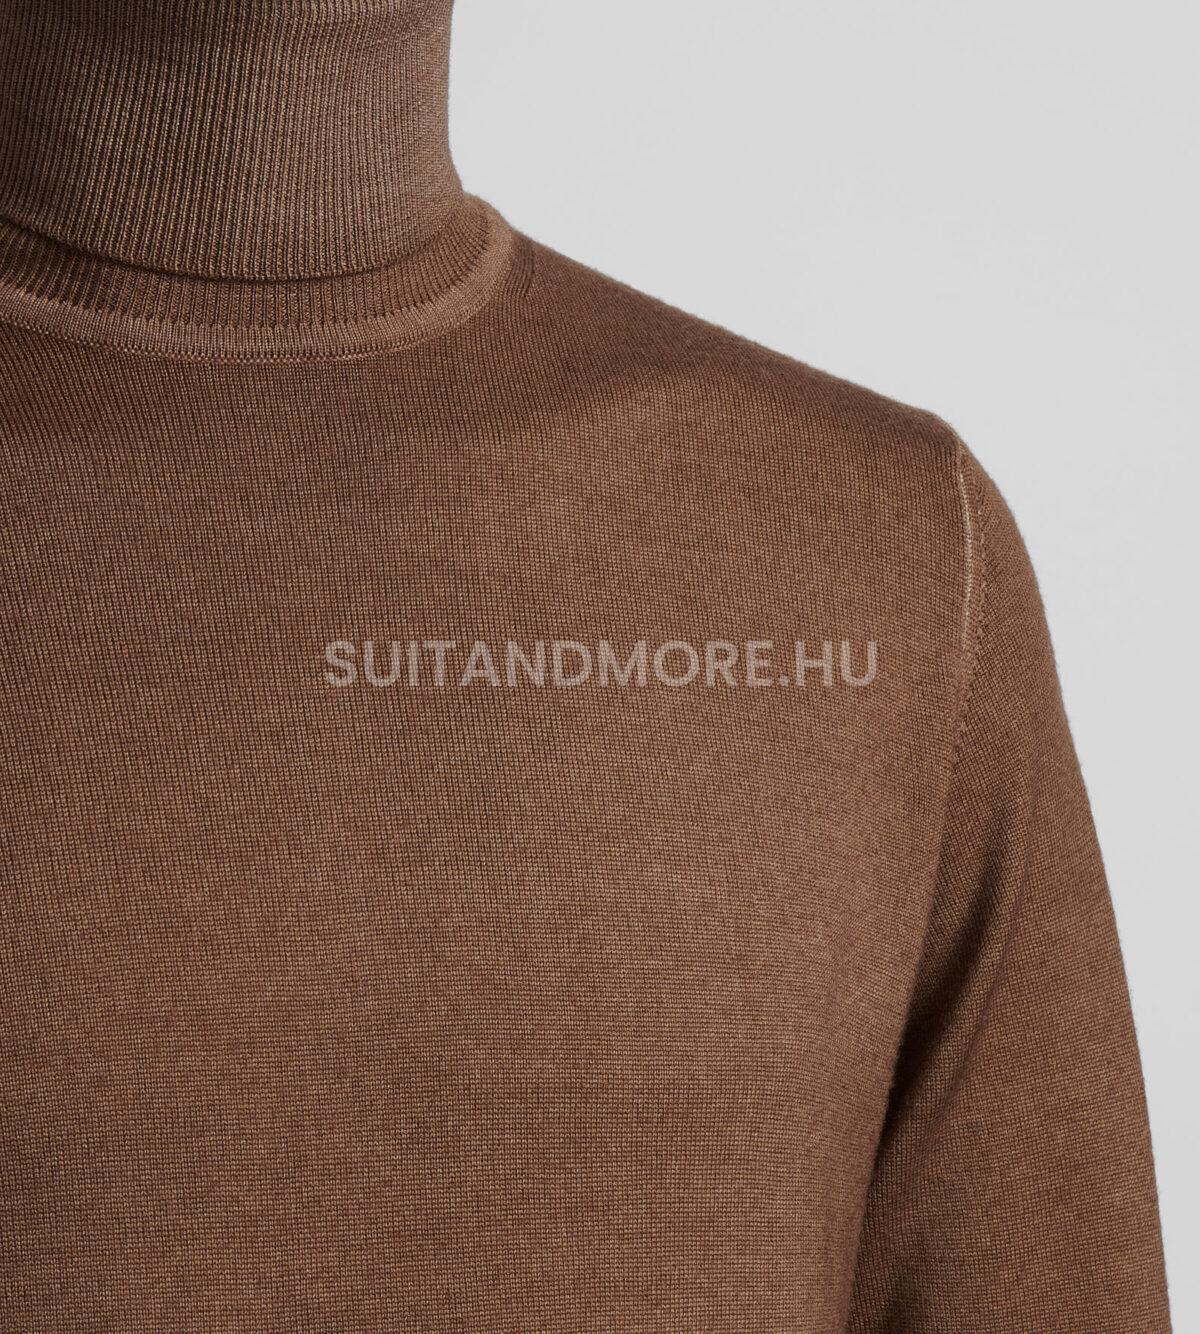 digel-barna-modern-fit-garbo-nyaku-gyapju-pulover-francis1-1-1288001-32-02